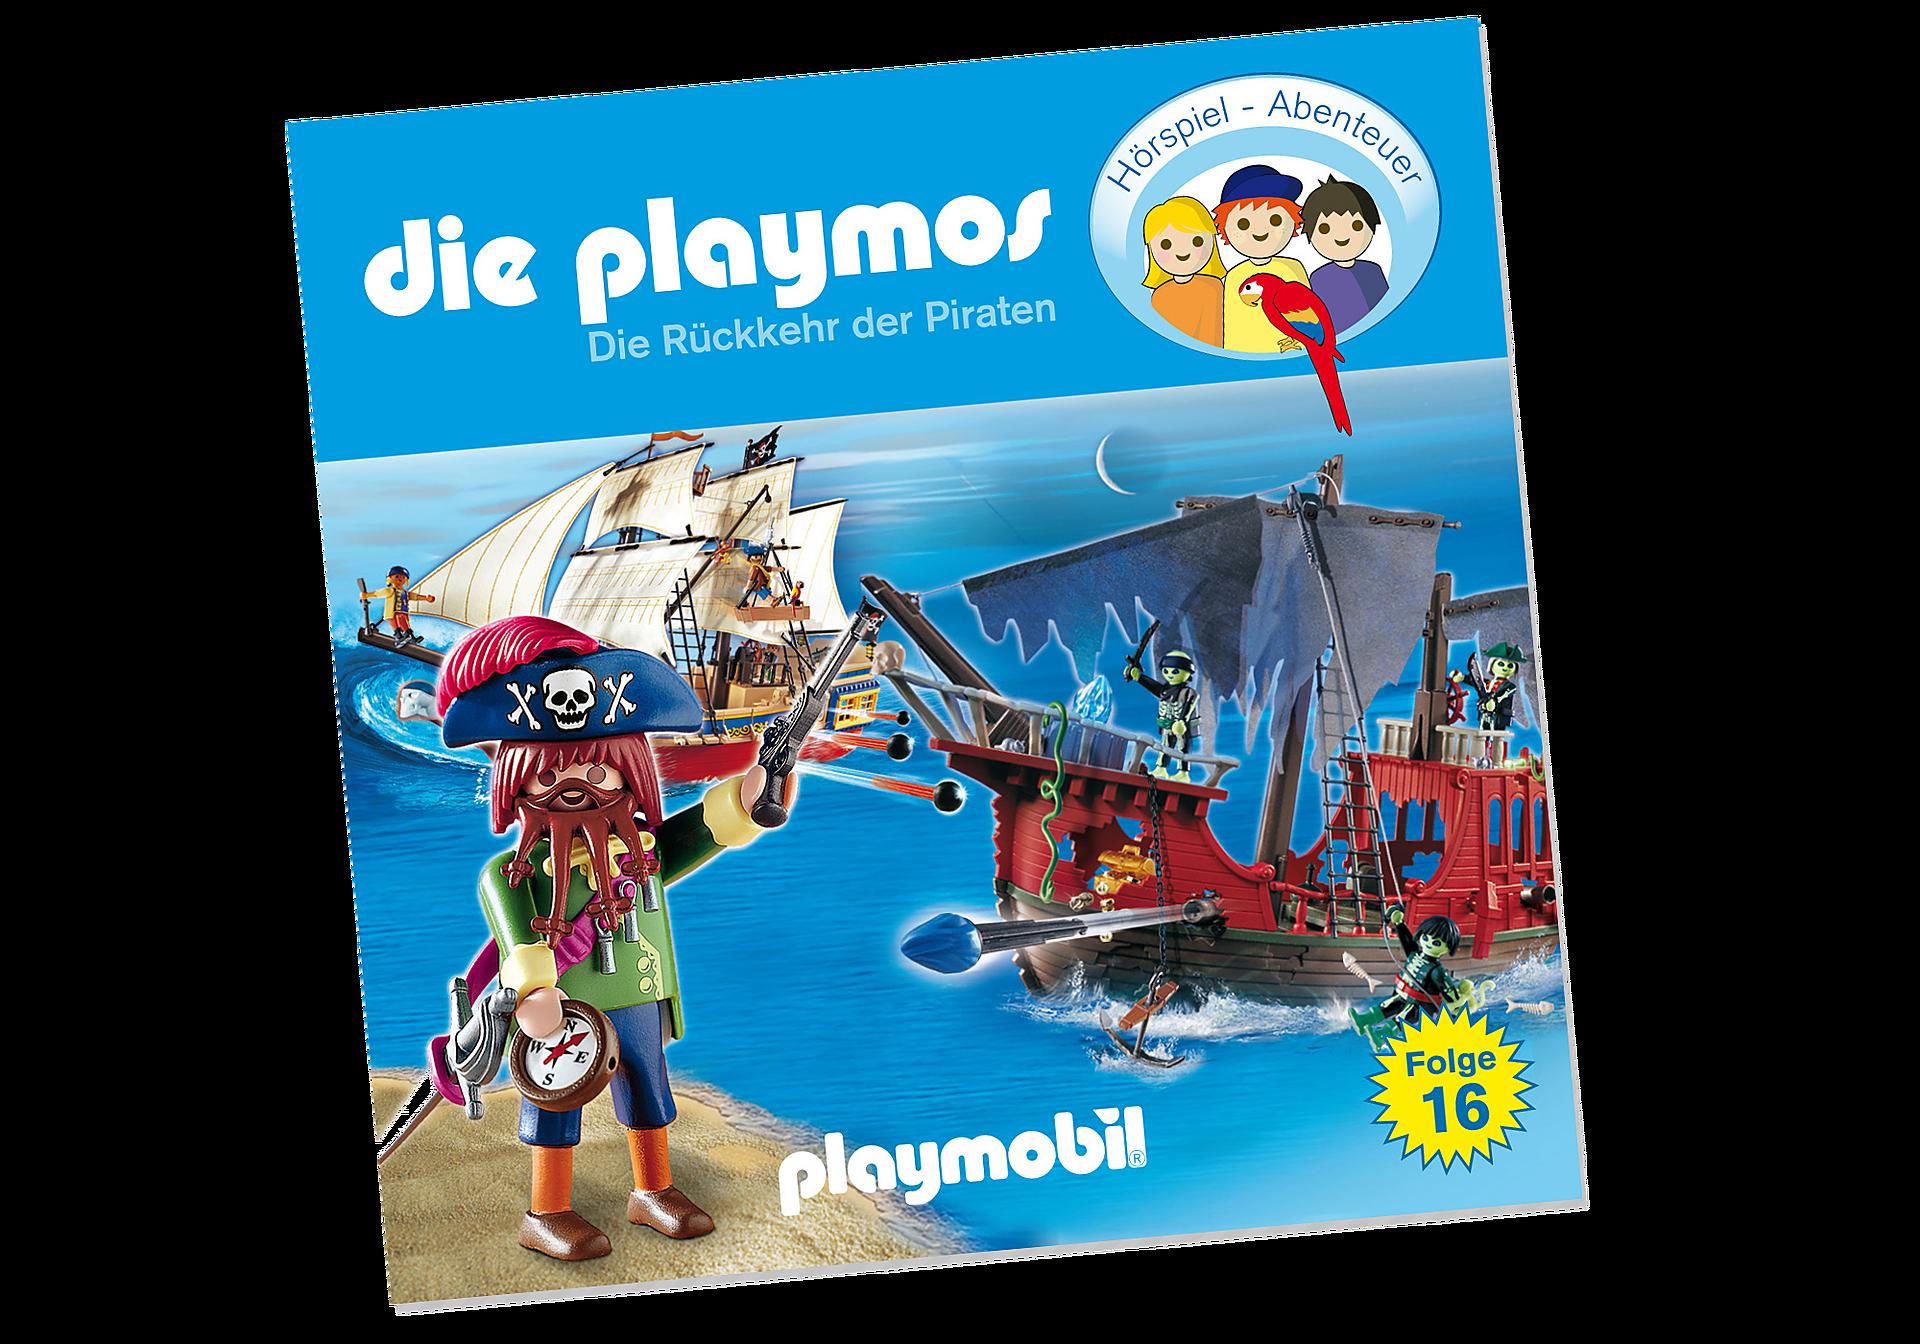 http://media.playmobil.com/i/playmobil/80262_product_detail/Die Rückkehr der Piraten (16) - CD